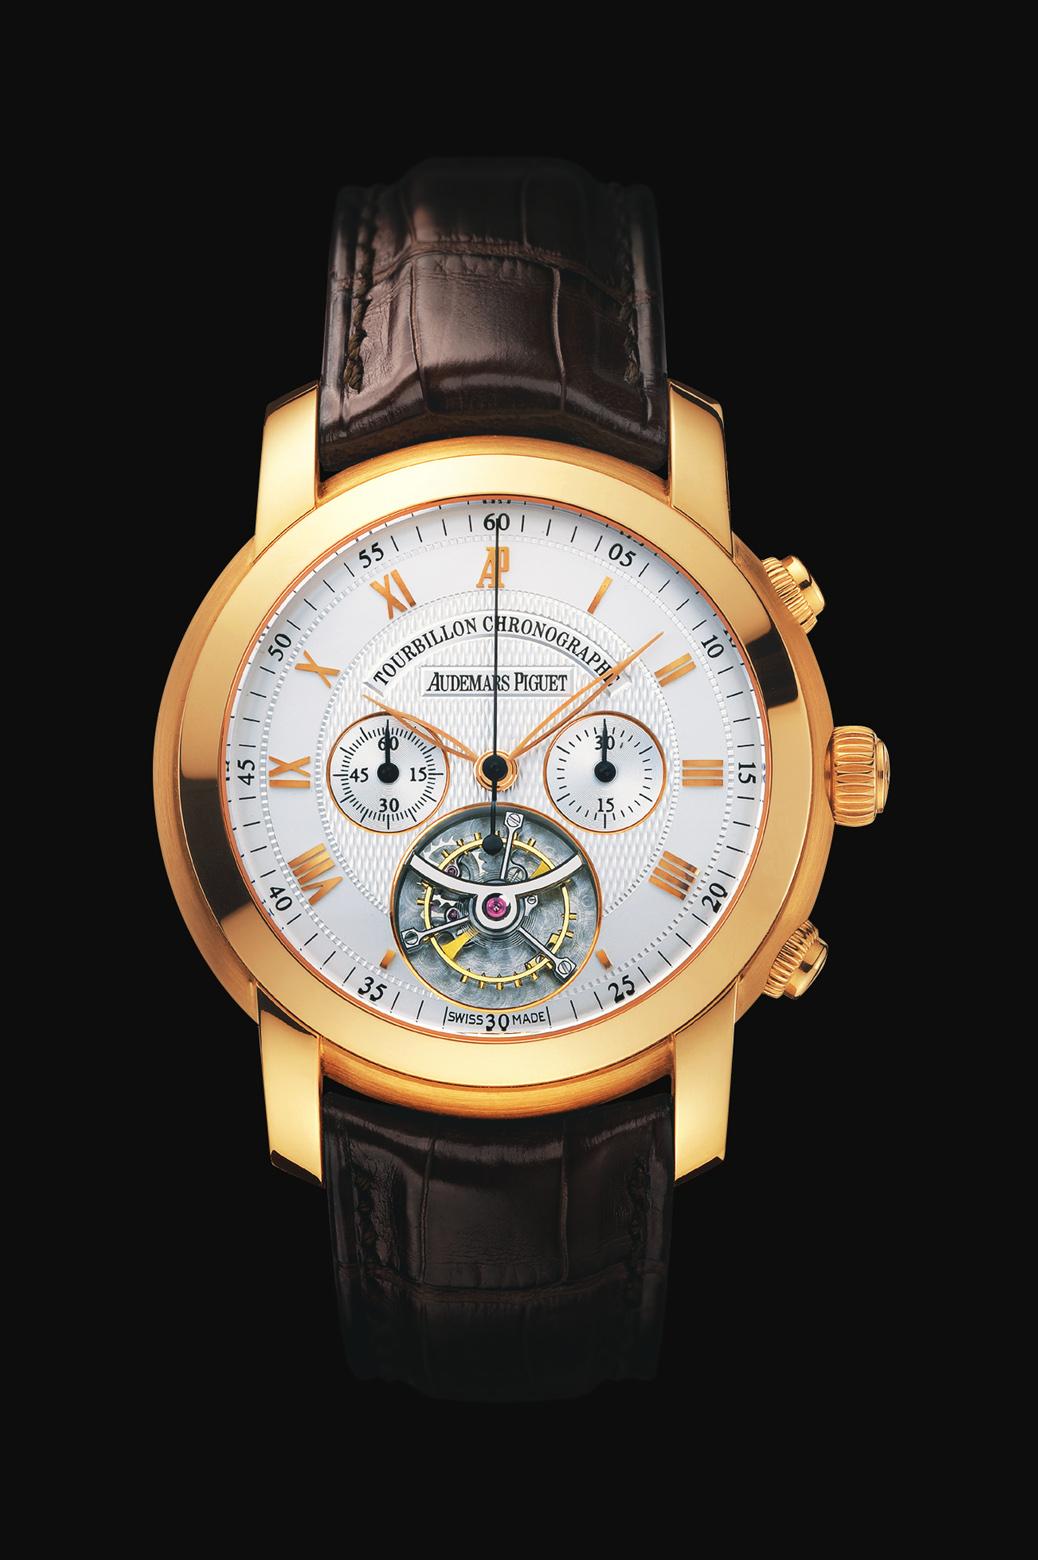 часы Audemars Piguet TOURBILLON CHRONOGRAPH